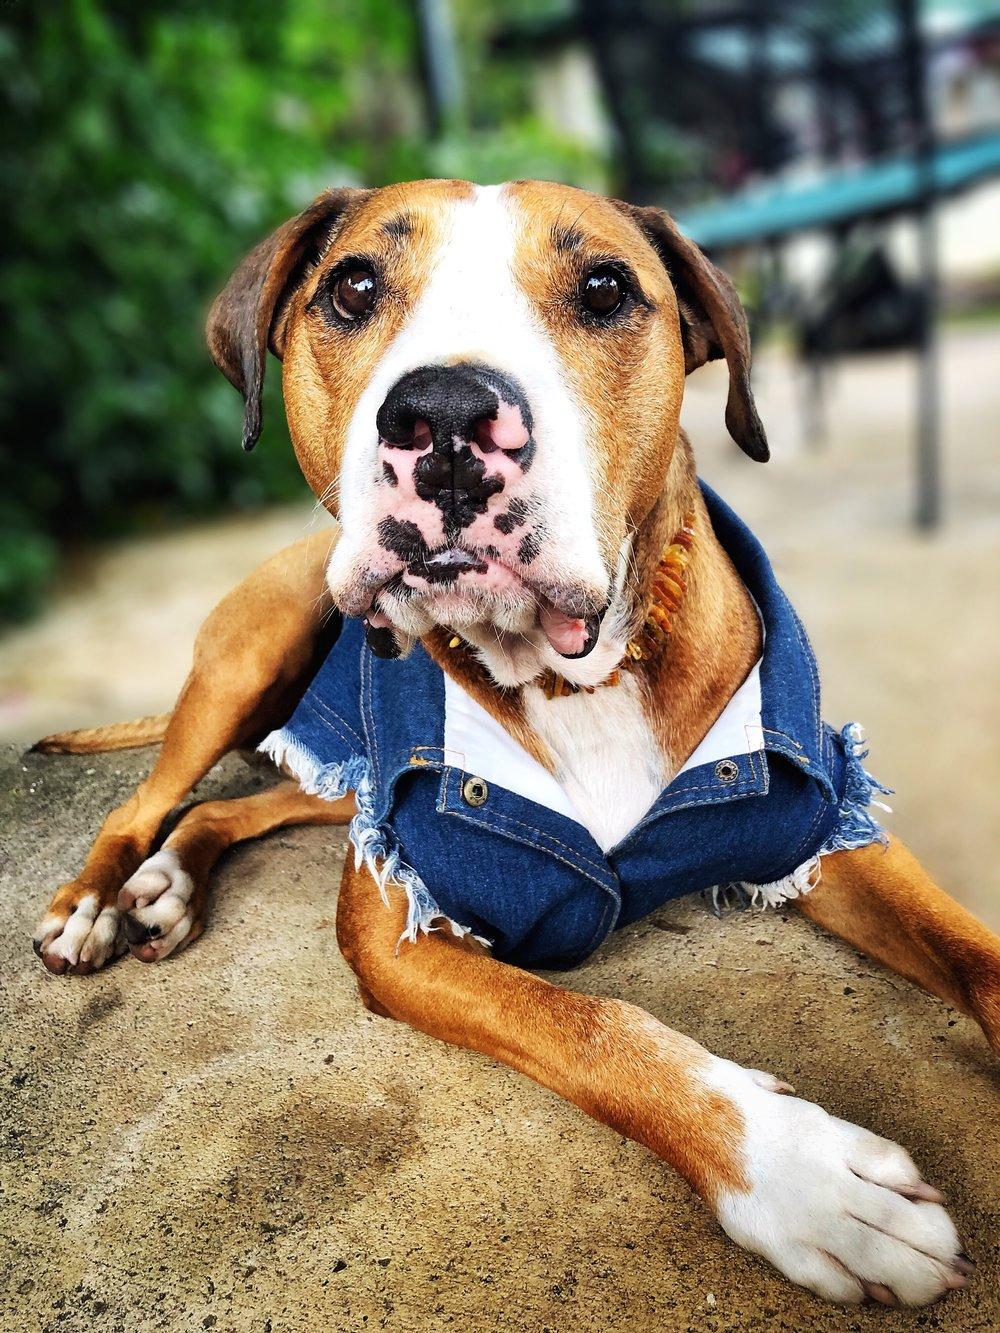 Amos rocking his  Pet Haus Denim Jacket  and his  Baltic Amber collar